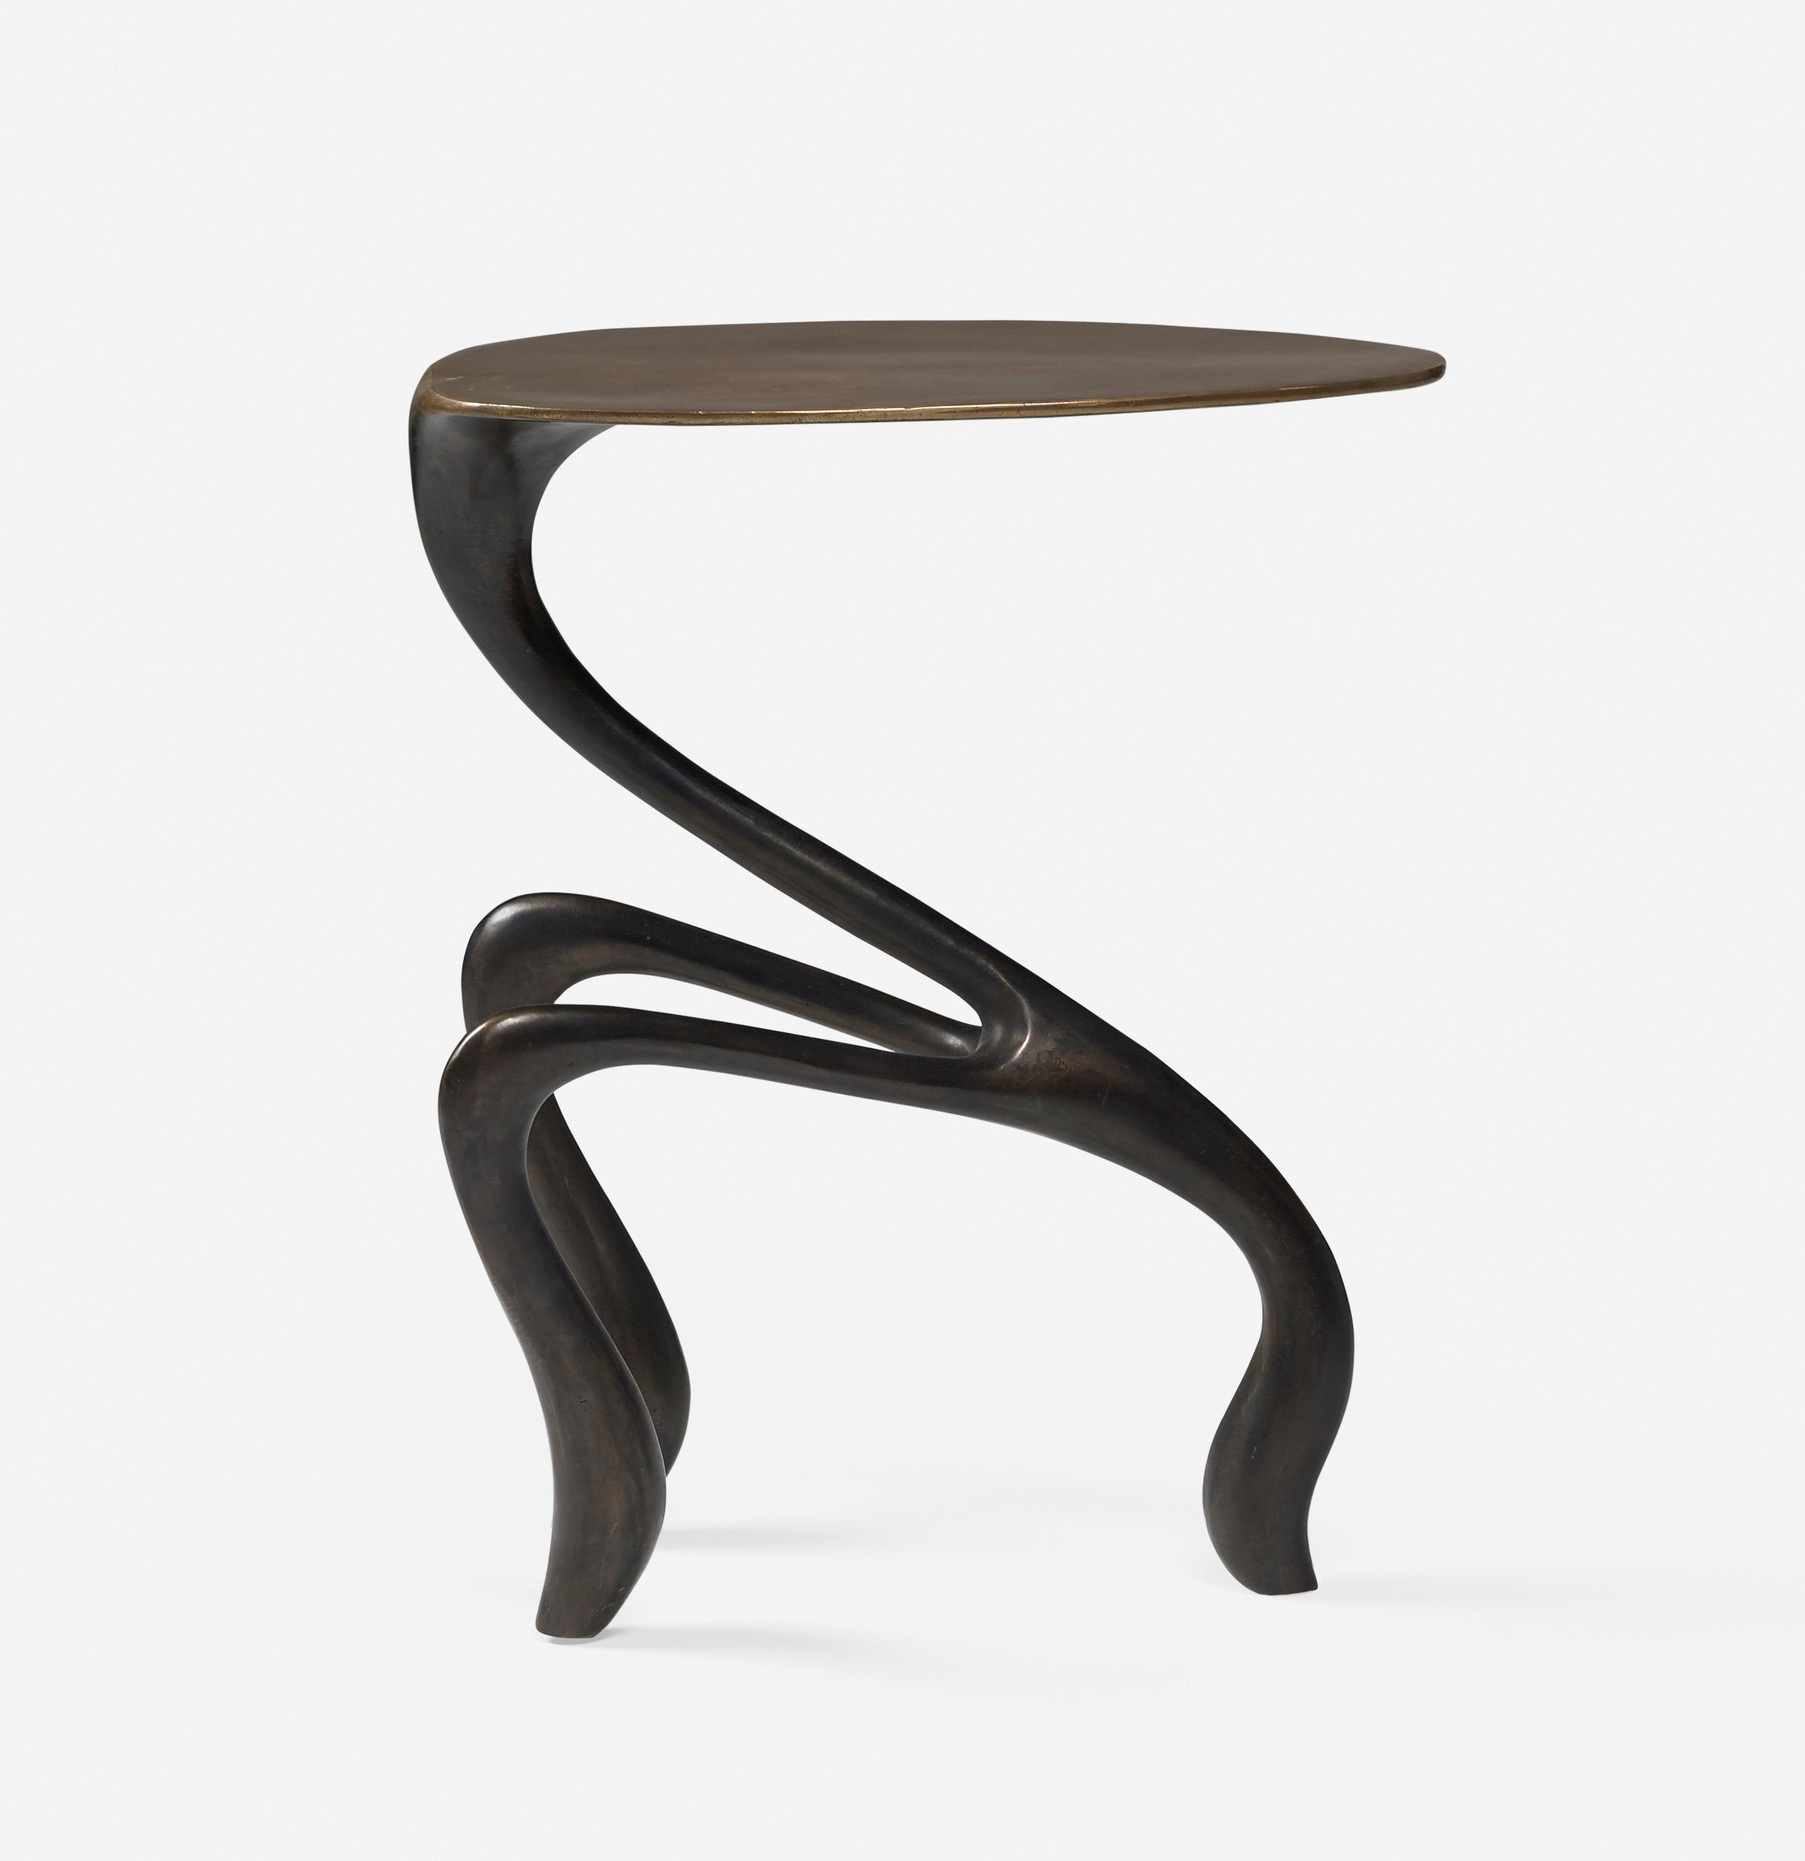 149_2GooseG%C5%AB%C3%9F_design_march_2015_jordan_mozer_prototype_goose_guss_table__wright_auction.jpg